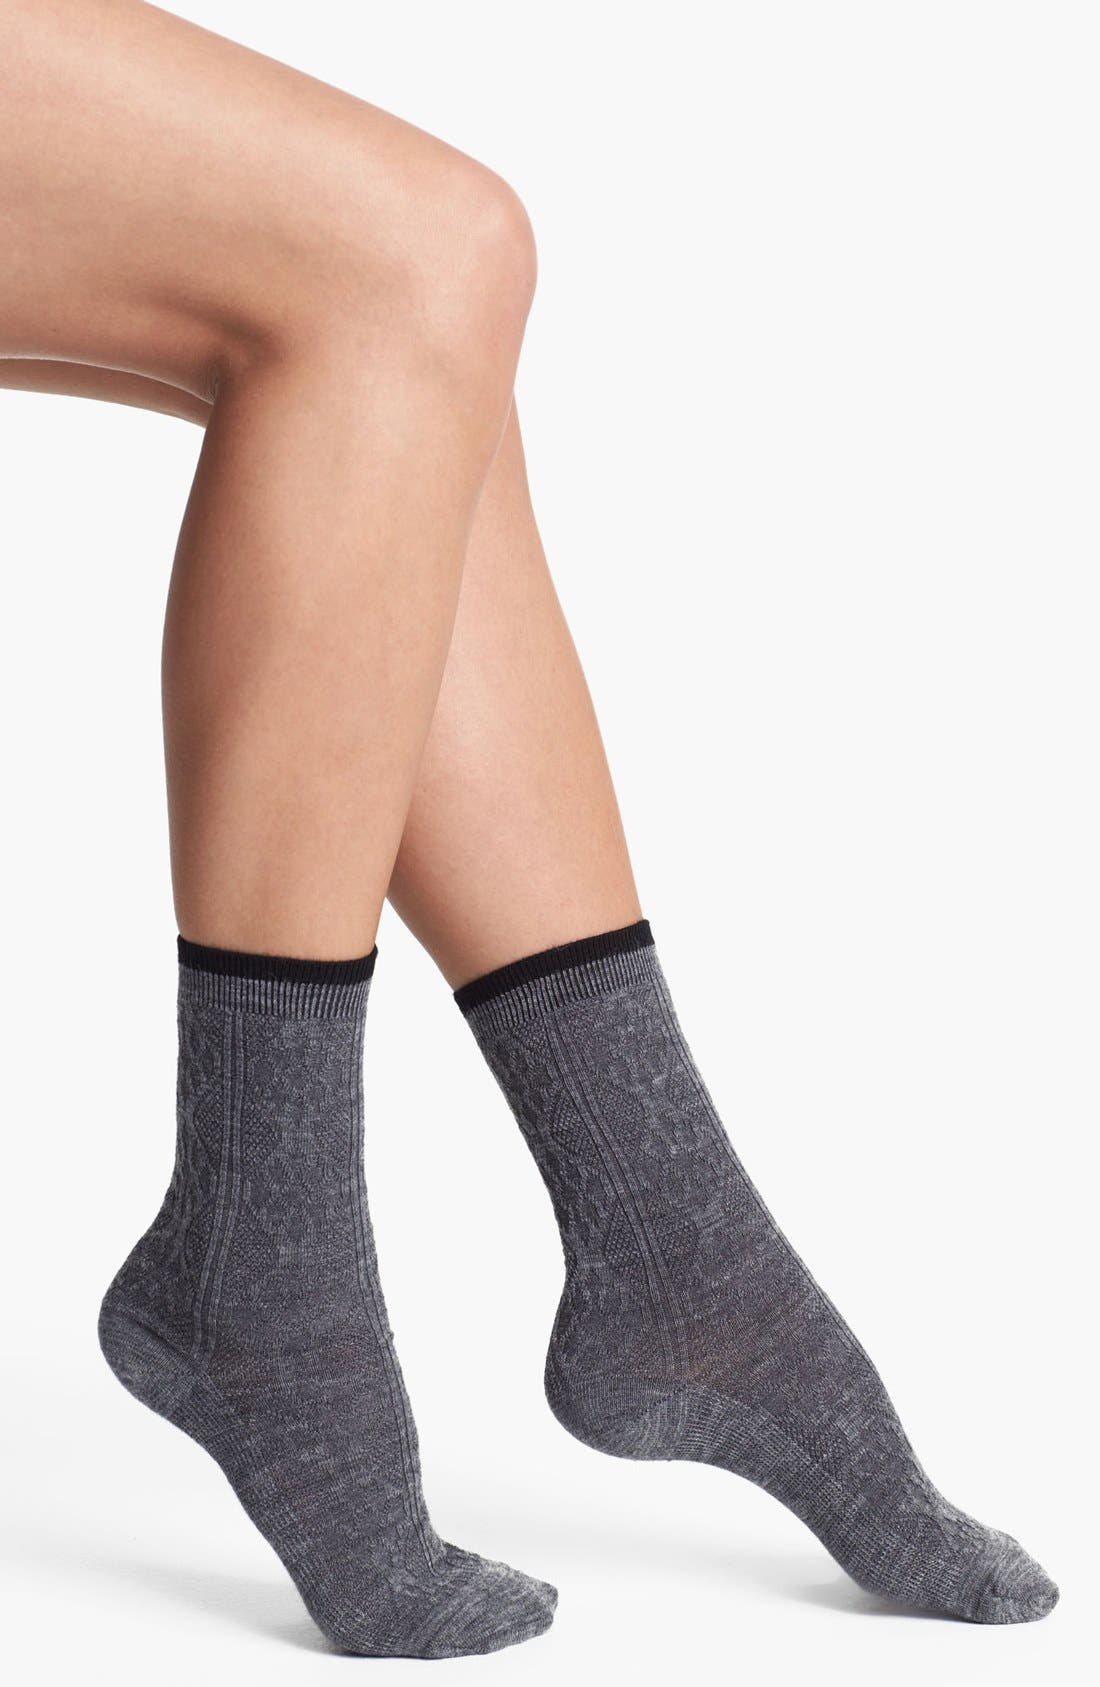 Alternate Image 1 Selected - Smartwool 'Trellis' Crew Socks